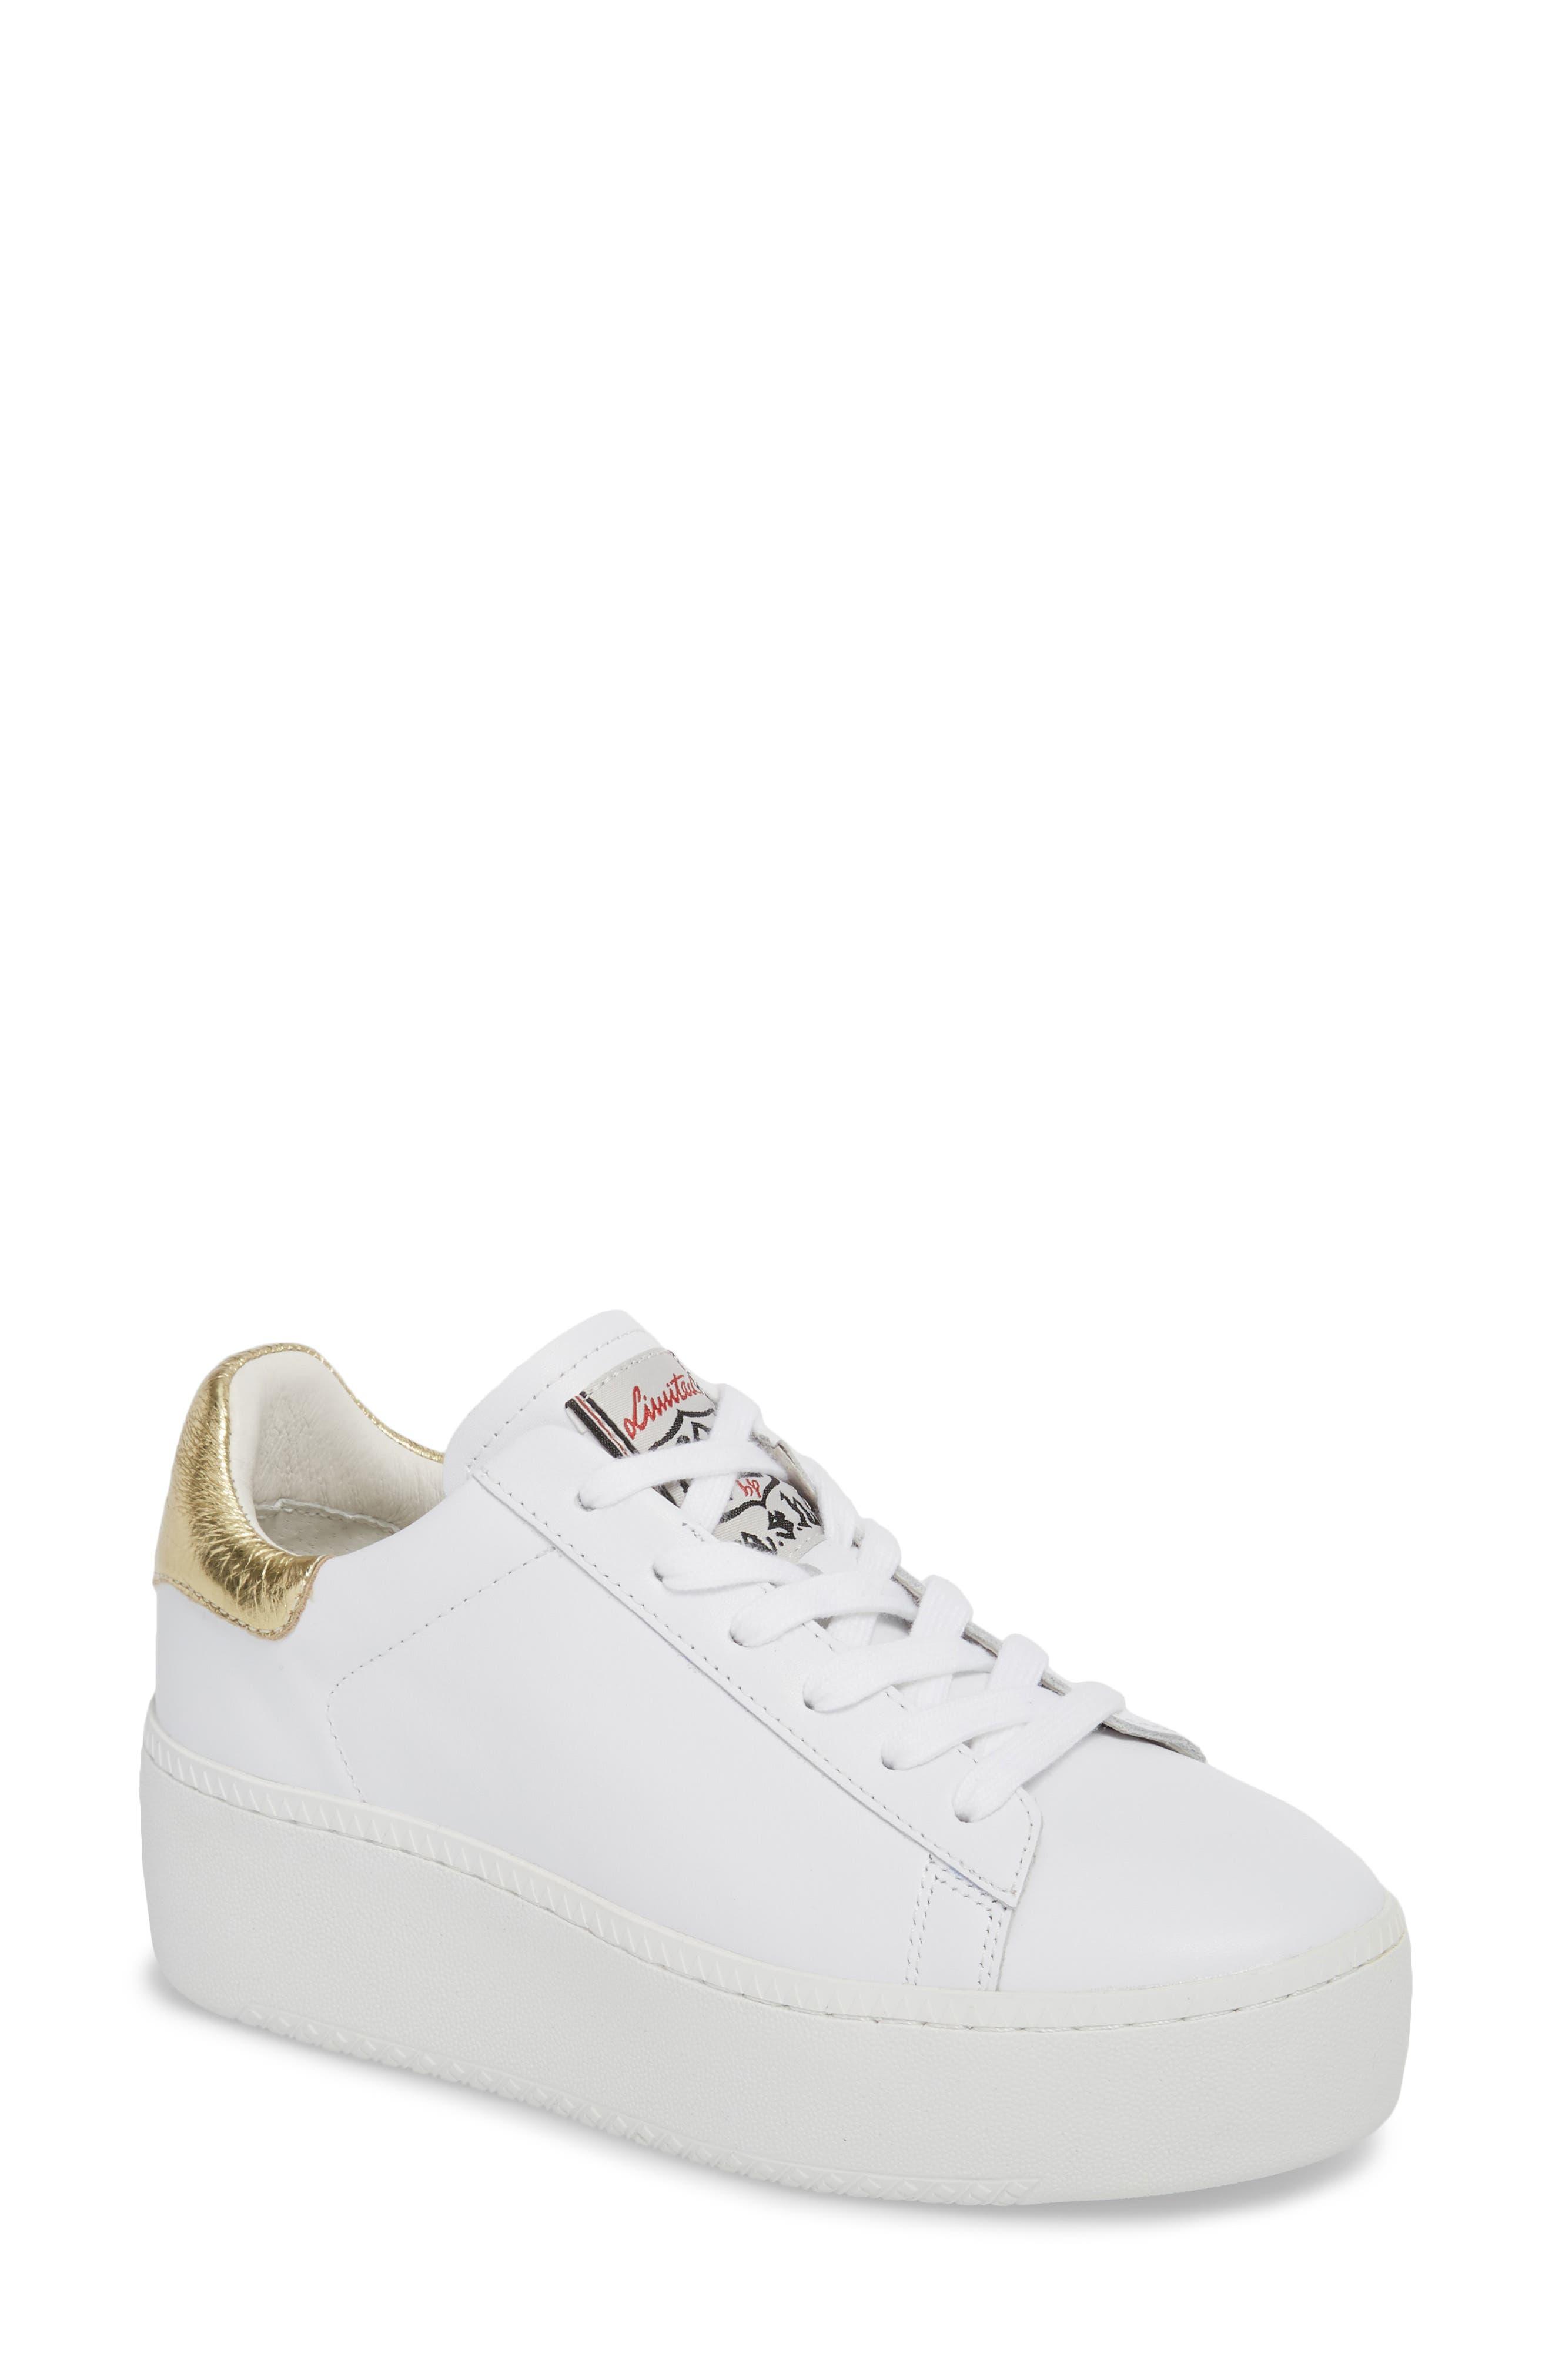 Cult Platform Sneaker,                             Main thumbnail 1, color,                             100